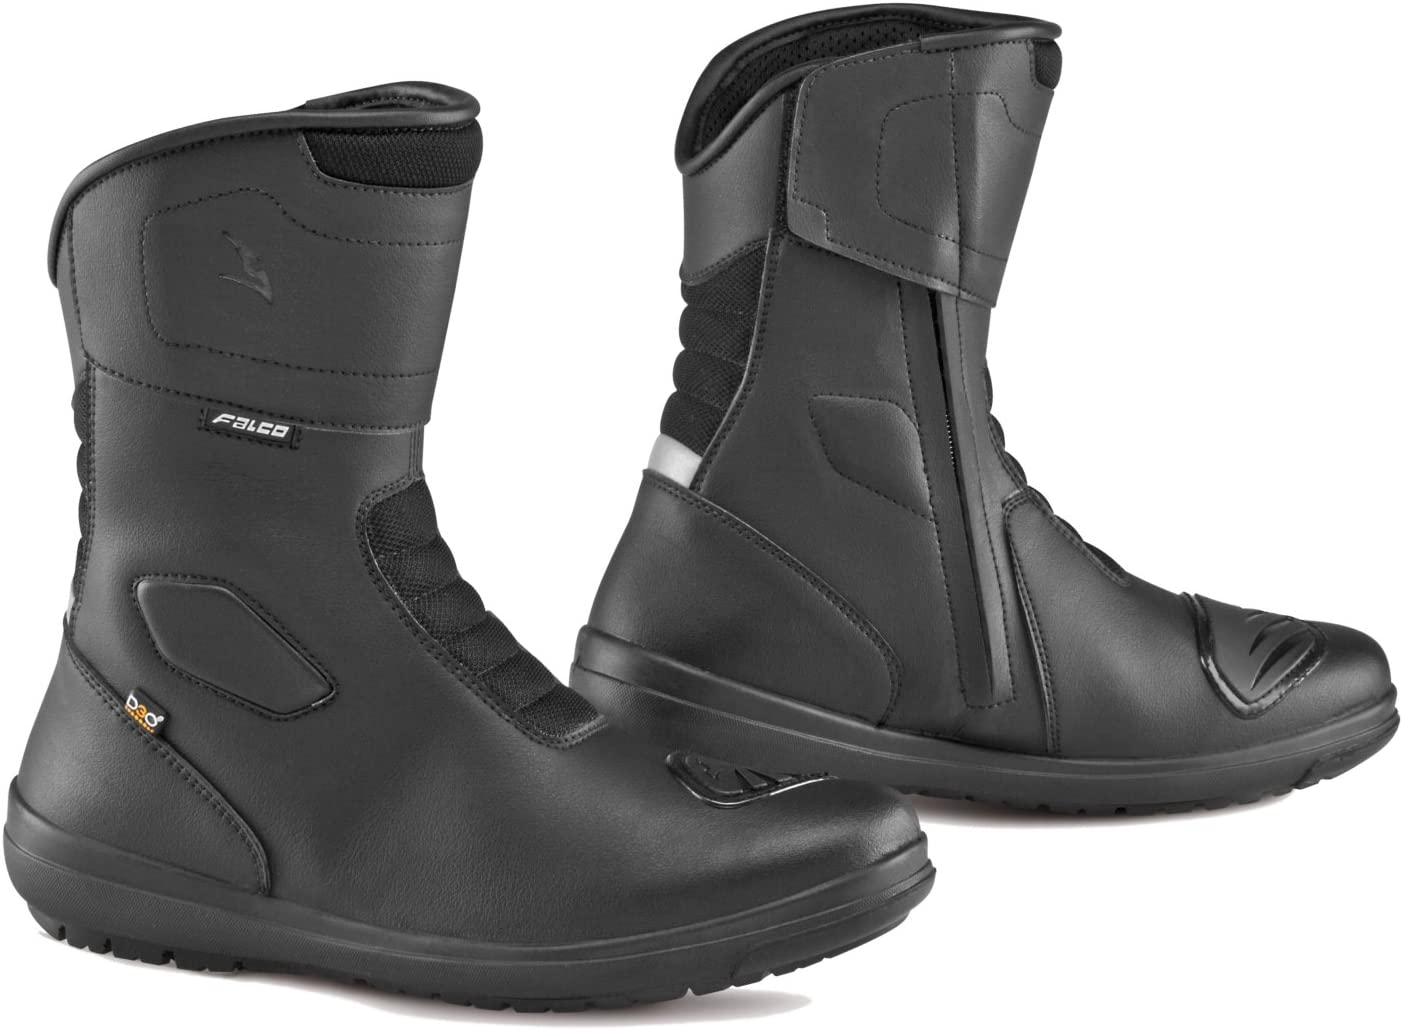 Falco Libertad 2.1/Carretera Estilo CE Aprobado Resistente al Agua para Moto Botas Negro